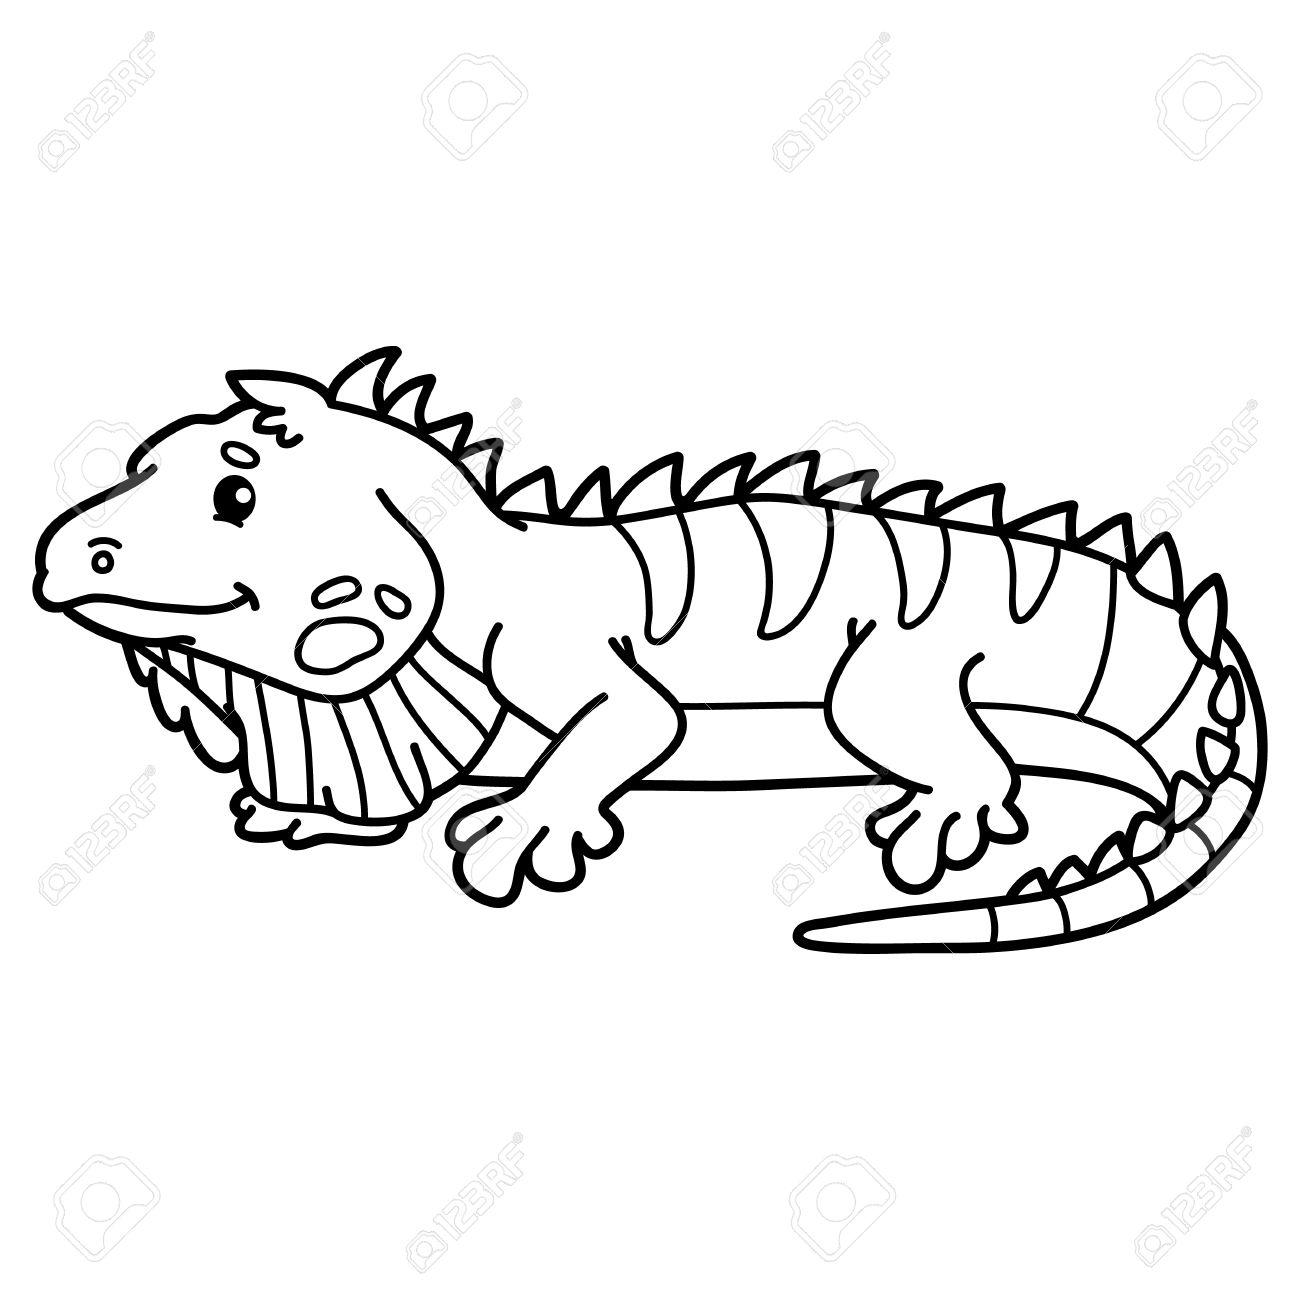 Cute Iguana. Illustration Of Cute Cartoon Iguana Character For ...